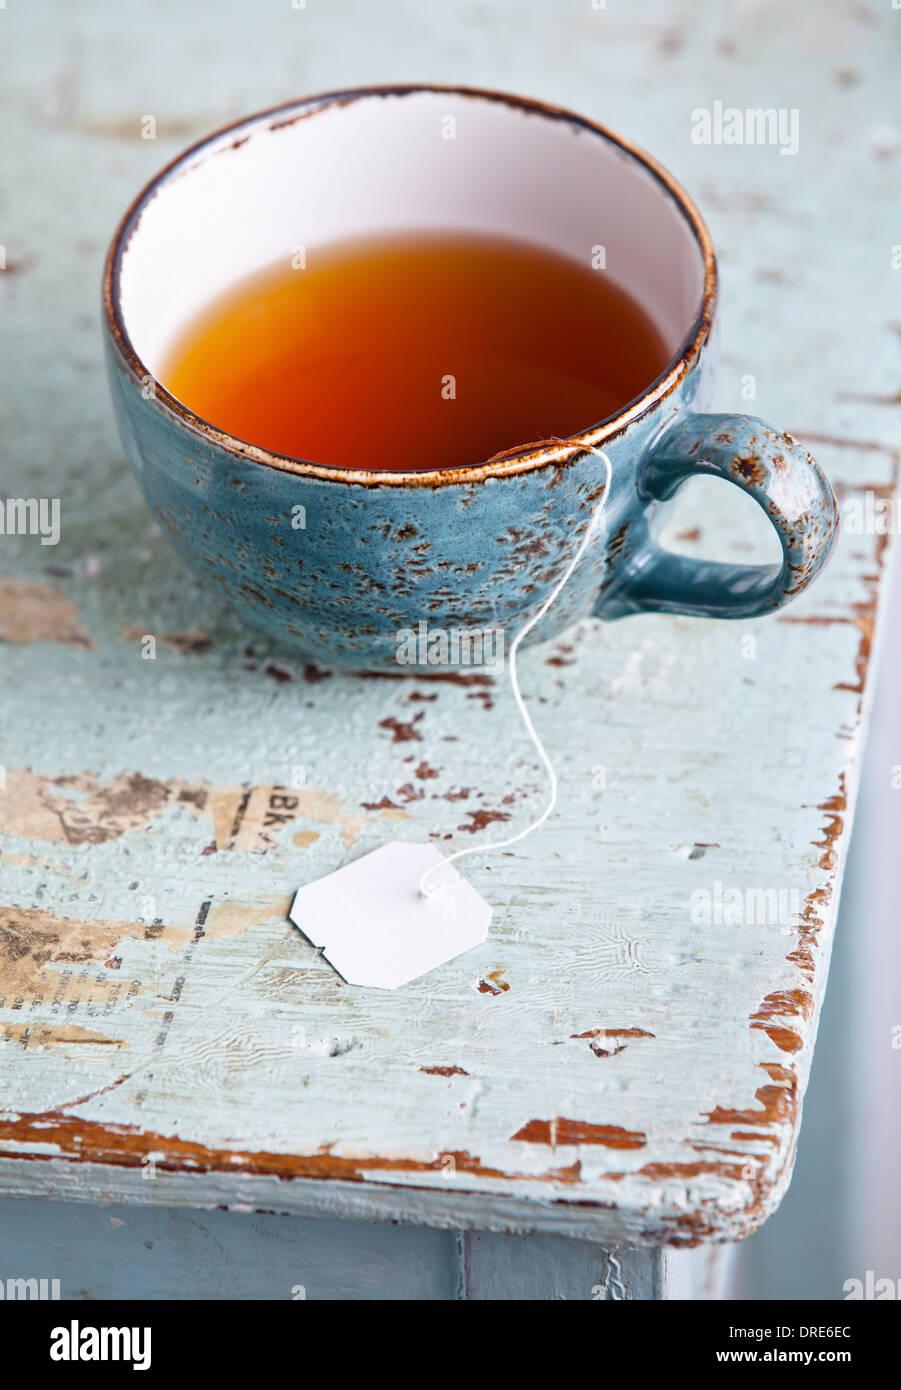 Taza de Té con la bolsita de té en el fondo de textura azul Imagen De Stock